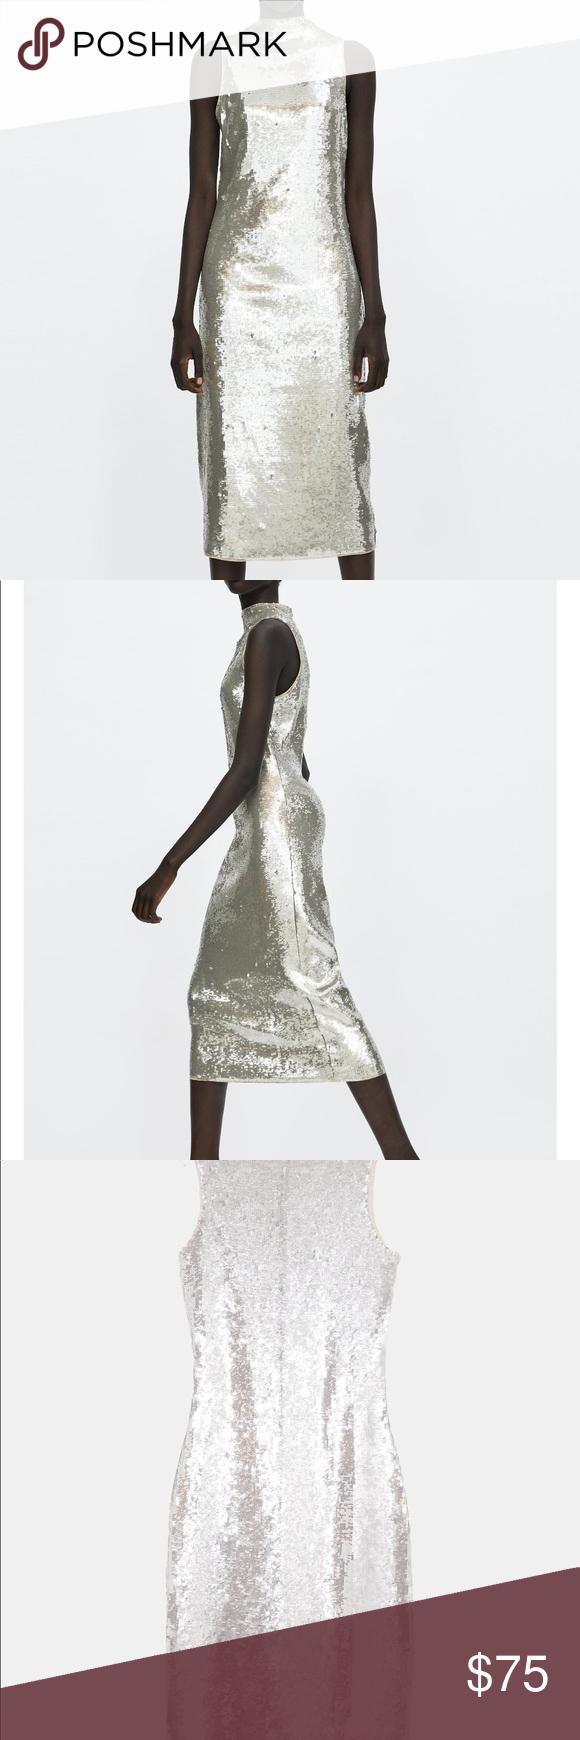 21de8935 Zara NWT midi silver sequin dress tulle lining $75 Zara NWT midi size M silver  sequin